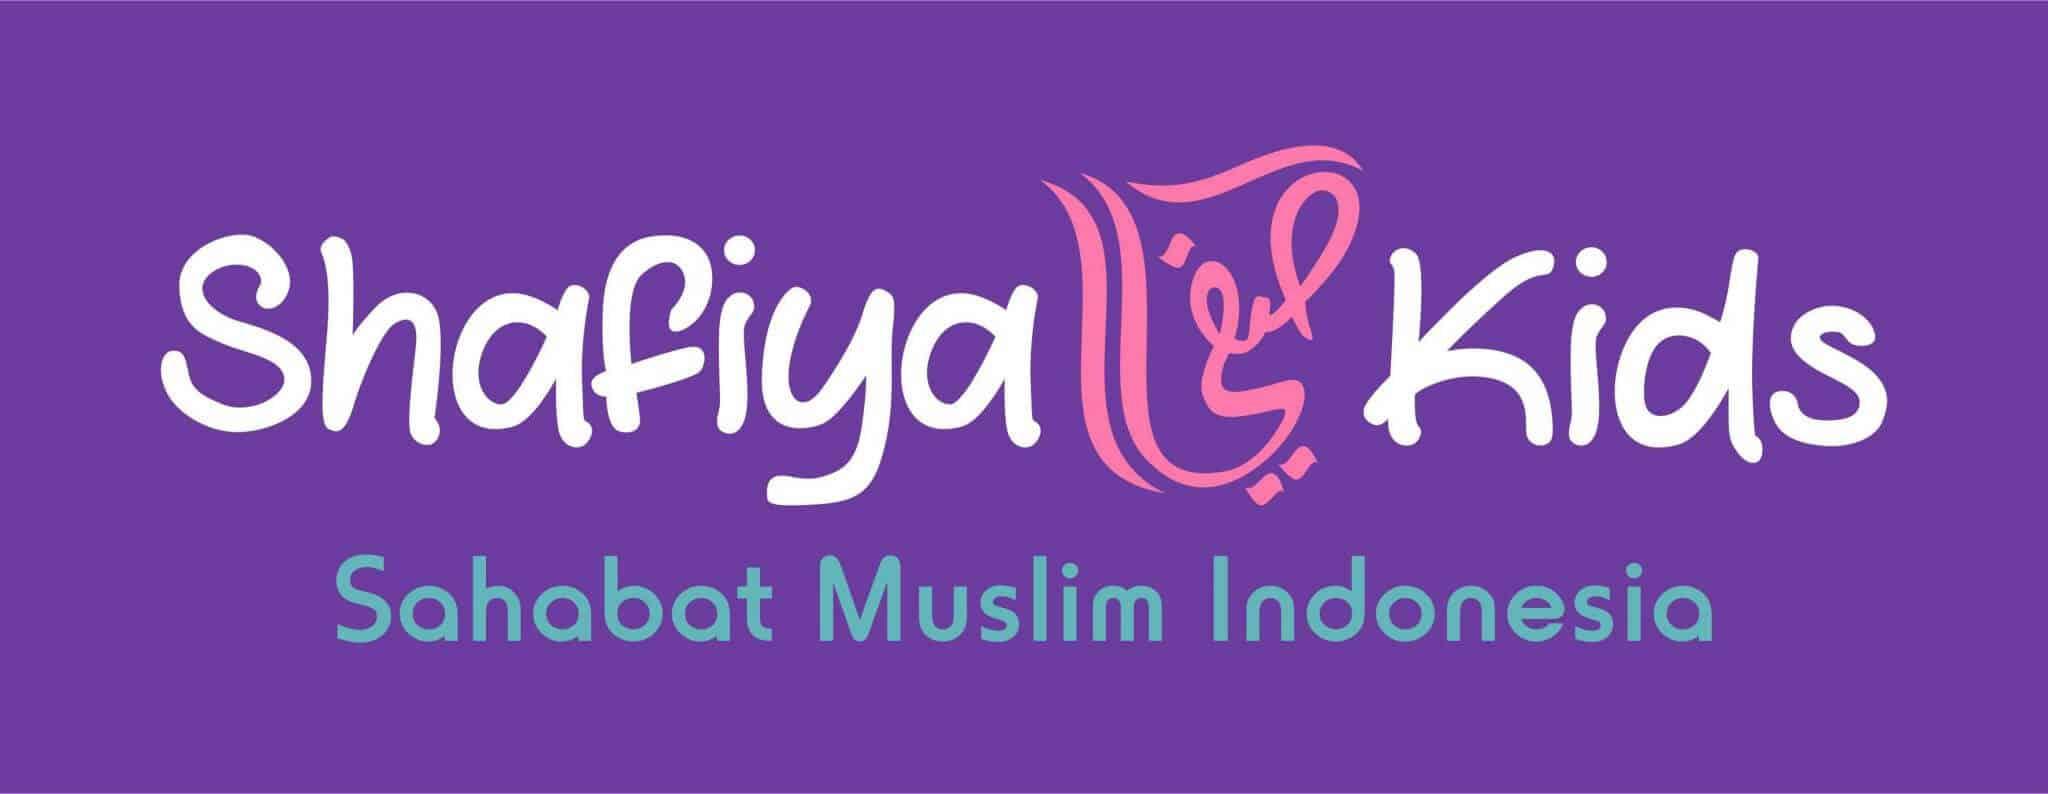 shafiya kids logo fixs panjang